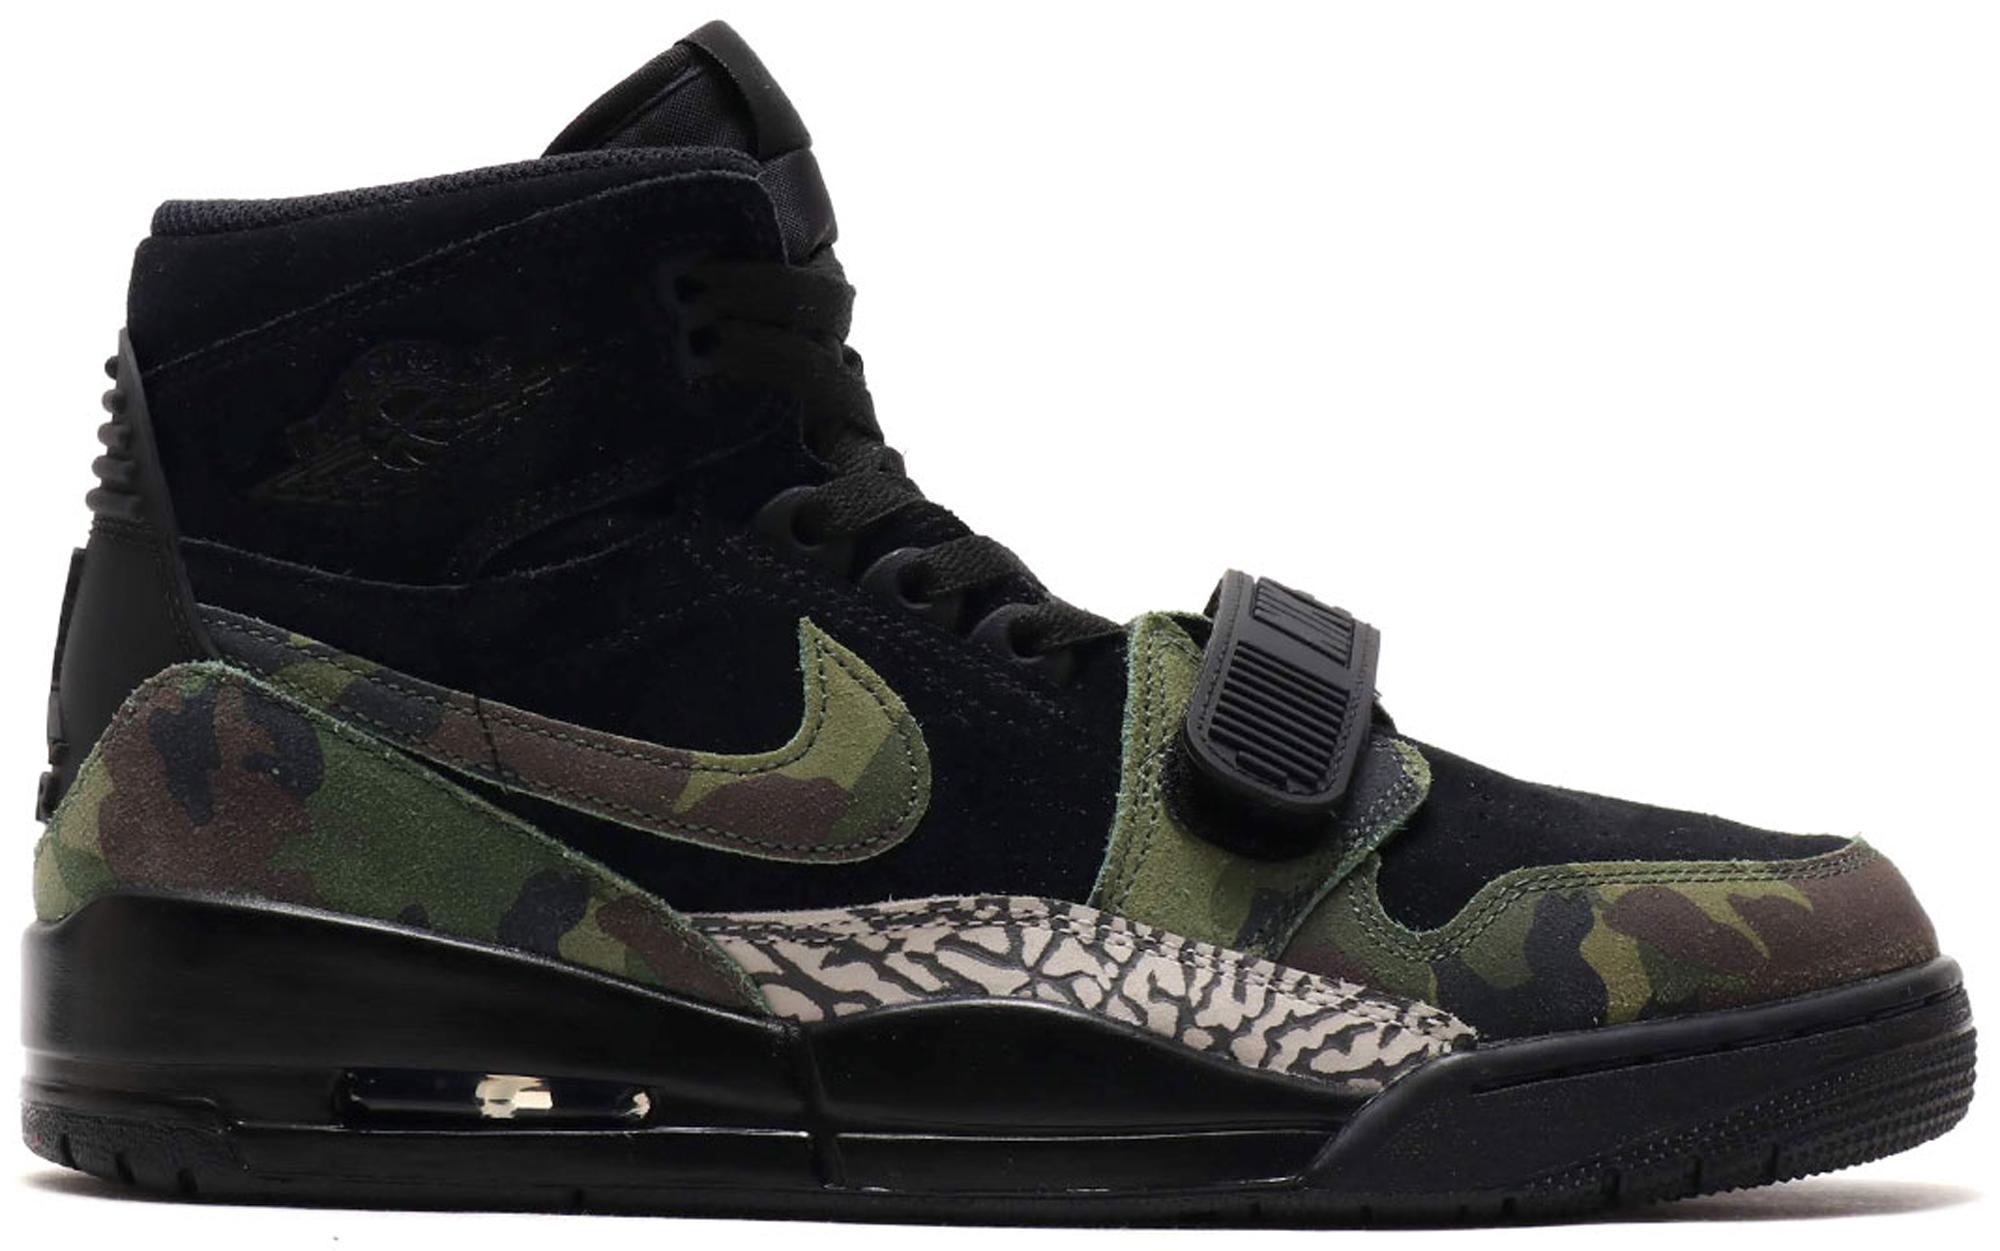 Jordan Legacy 312 Black Camo Green